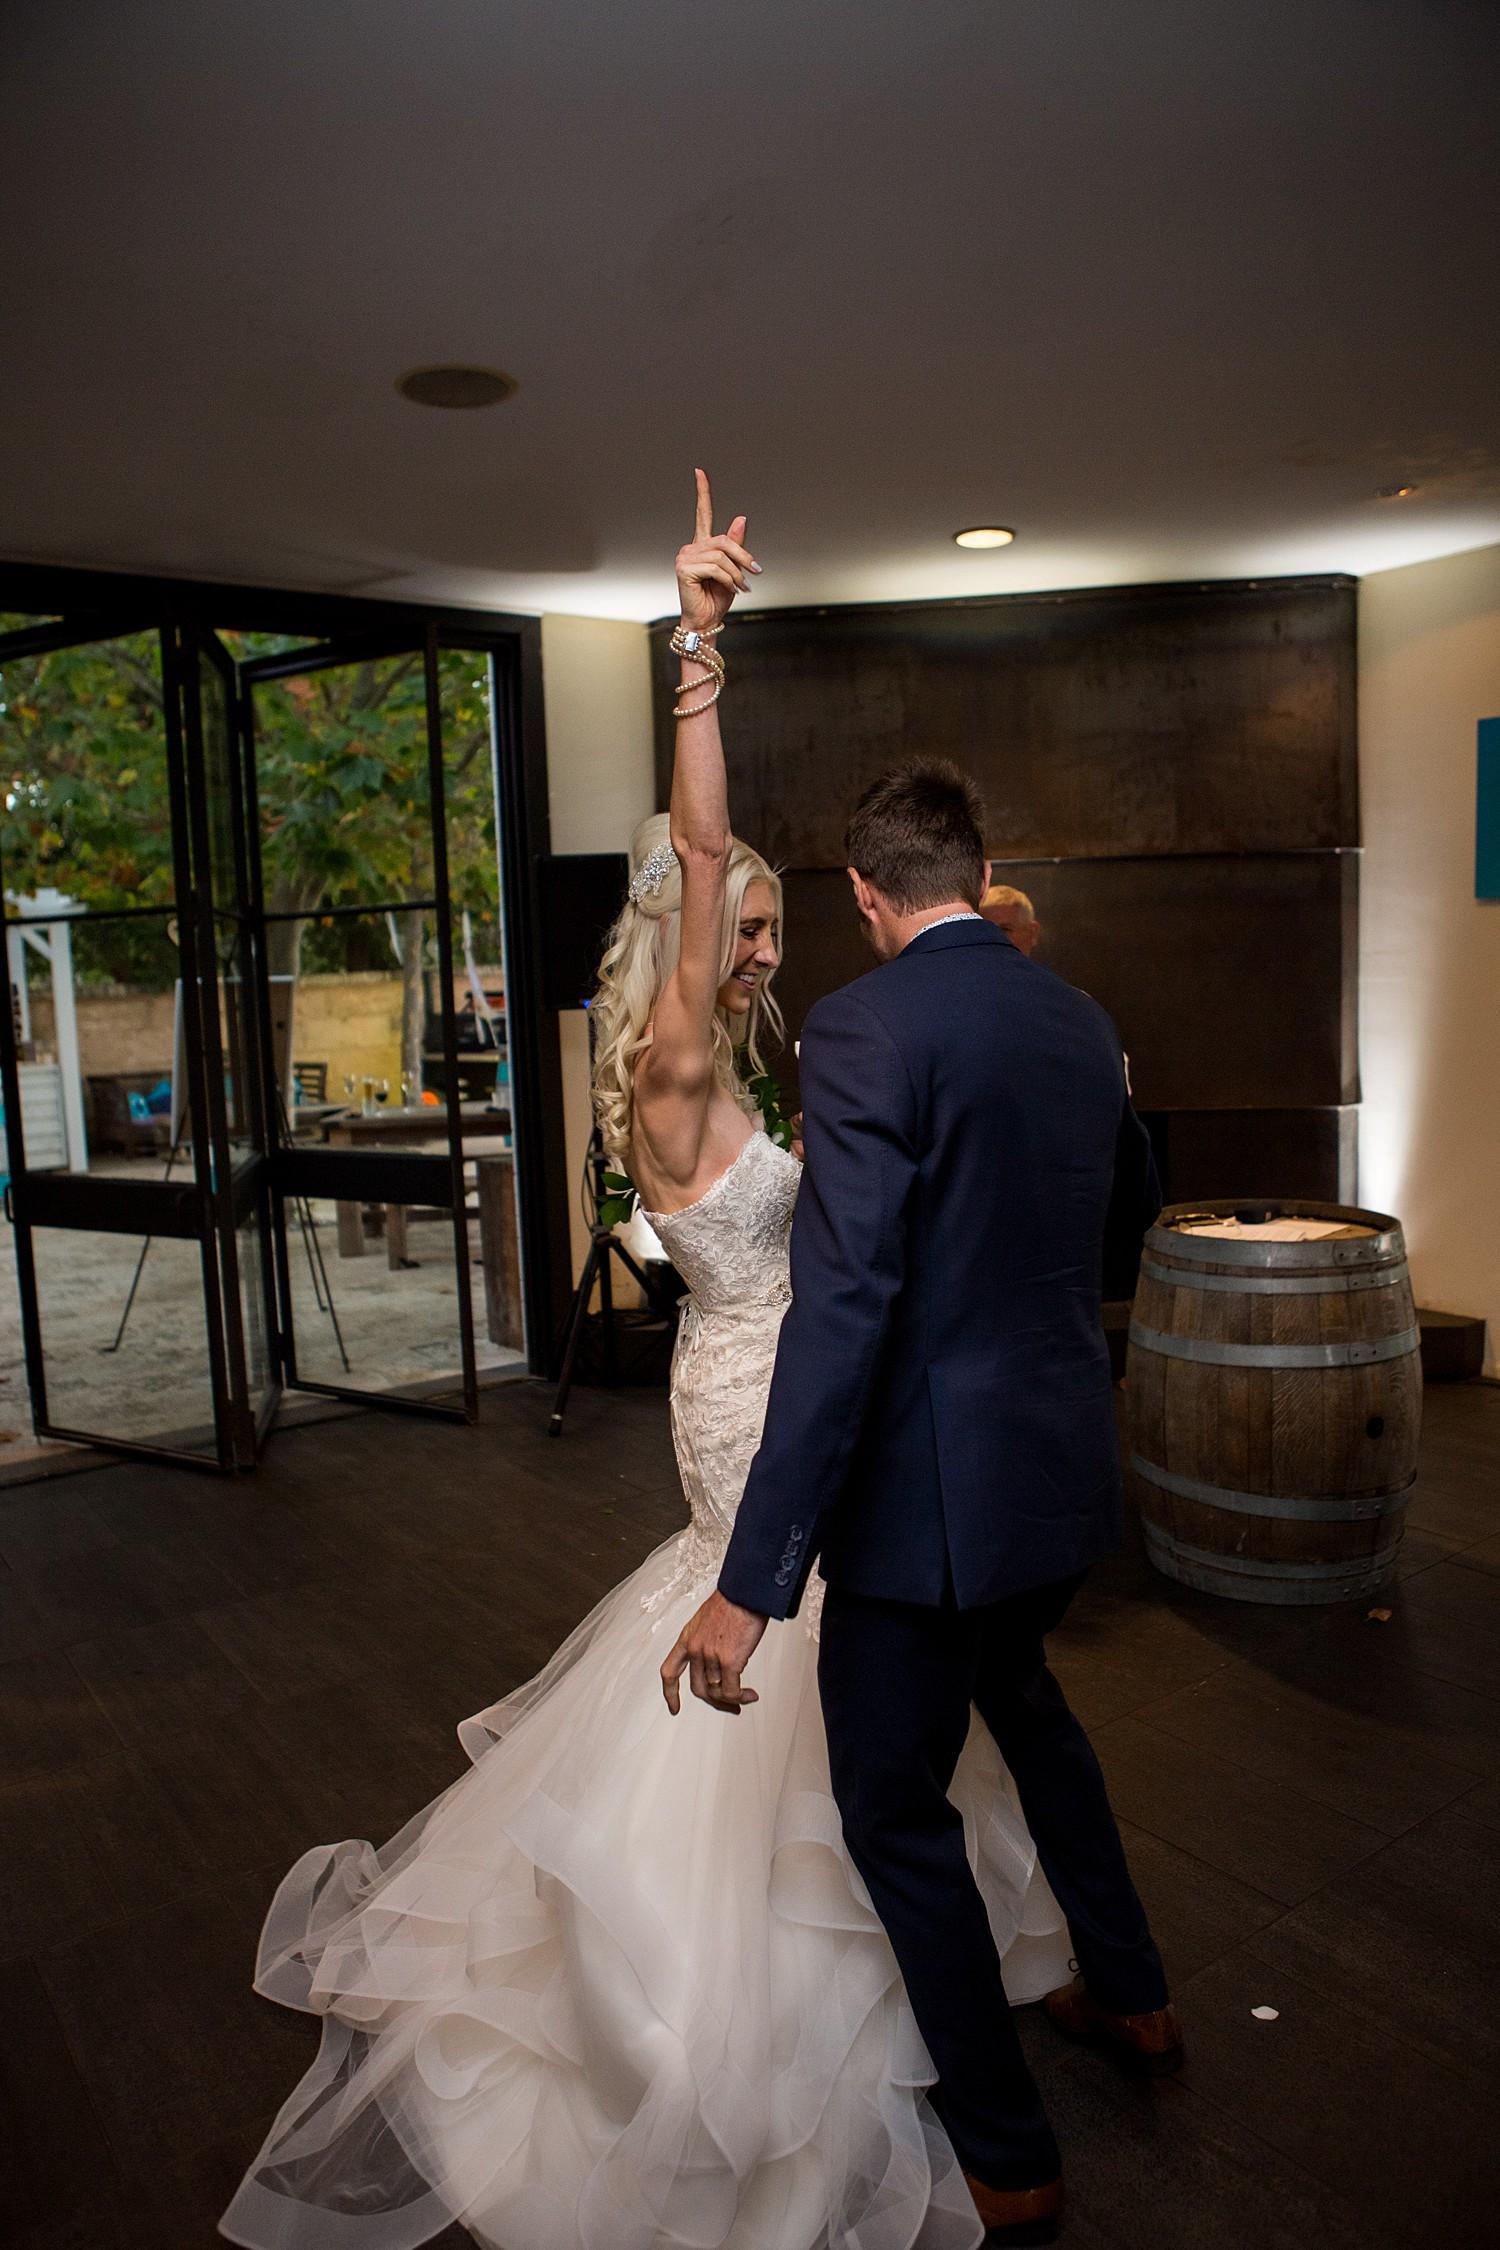 wise_wines_southwest_WA_wedding_0156.jpg